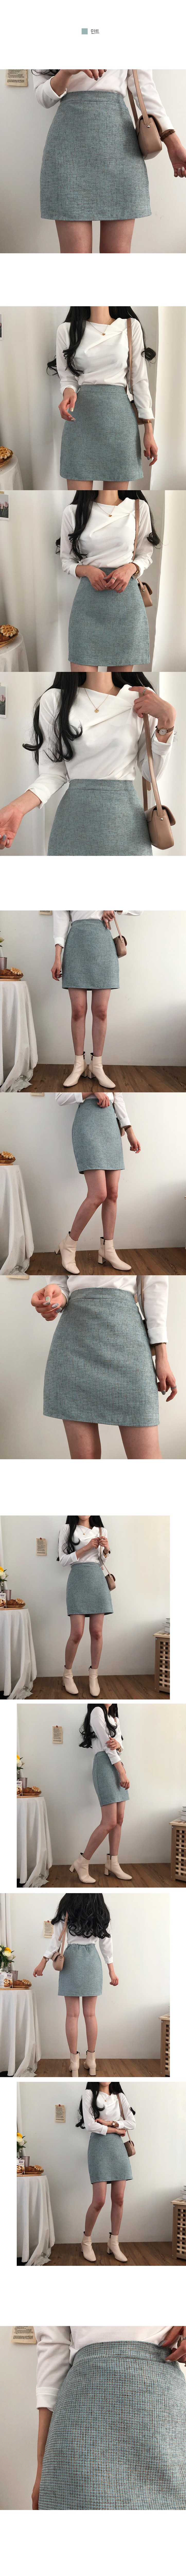 Darling soft Jancheck skirt